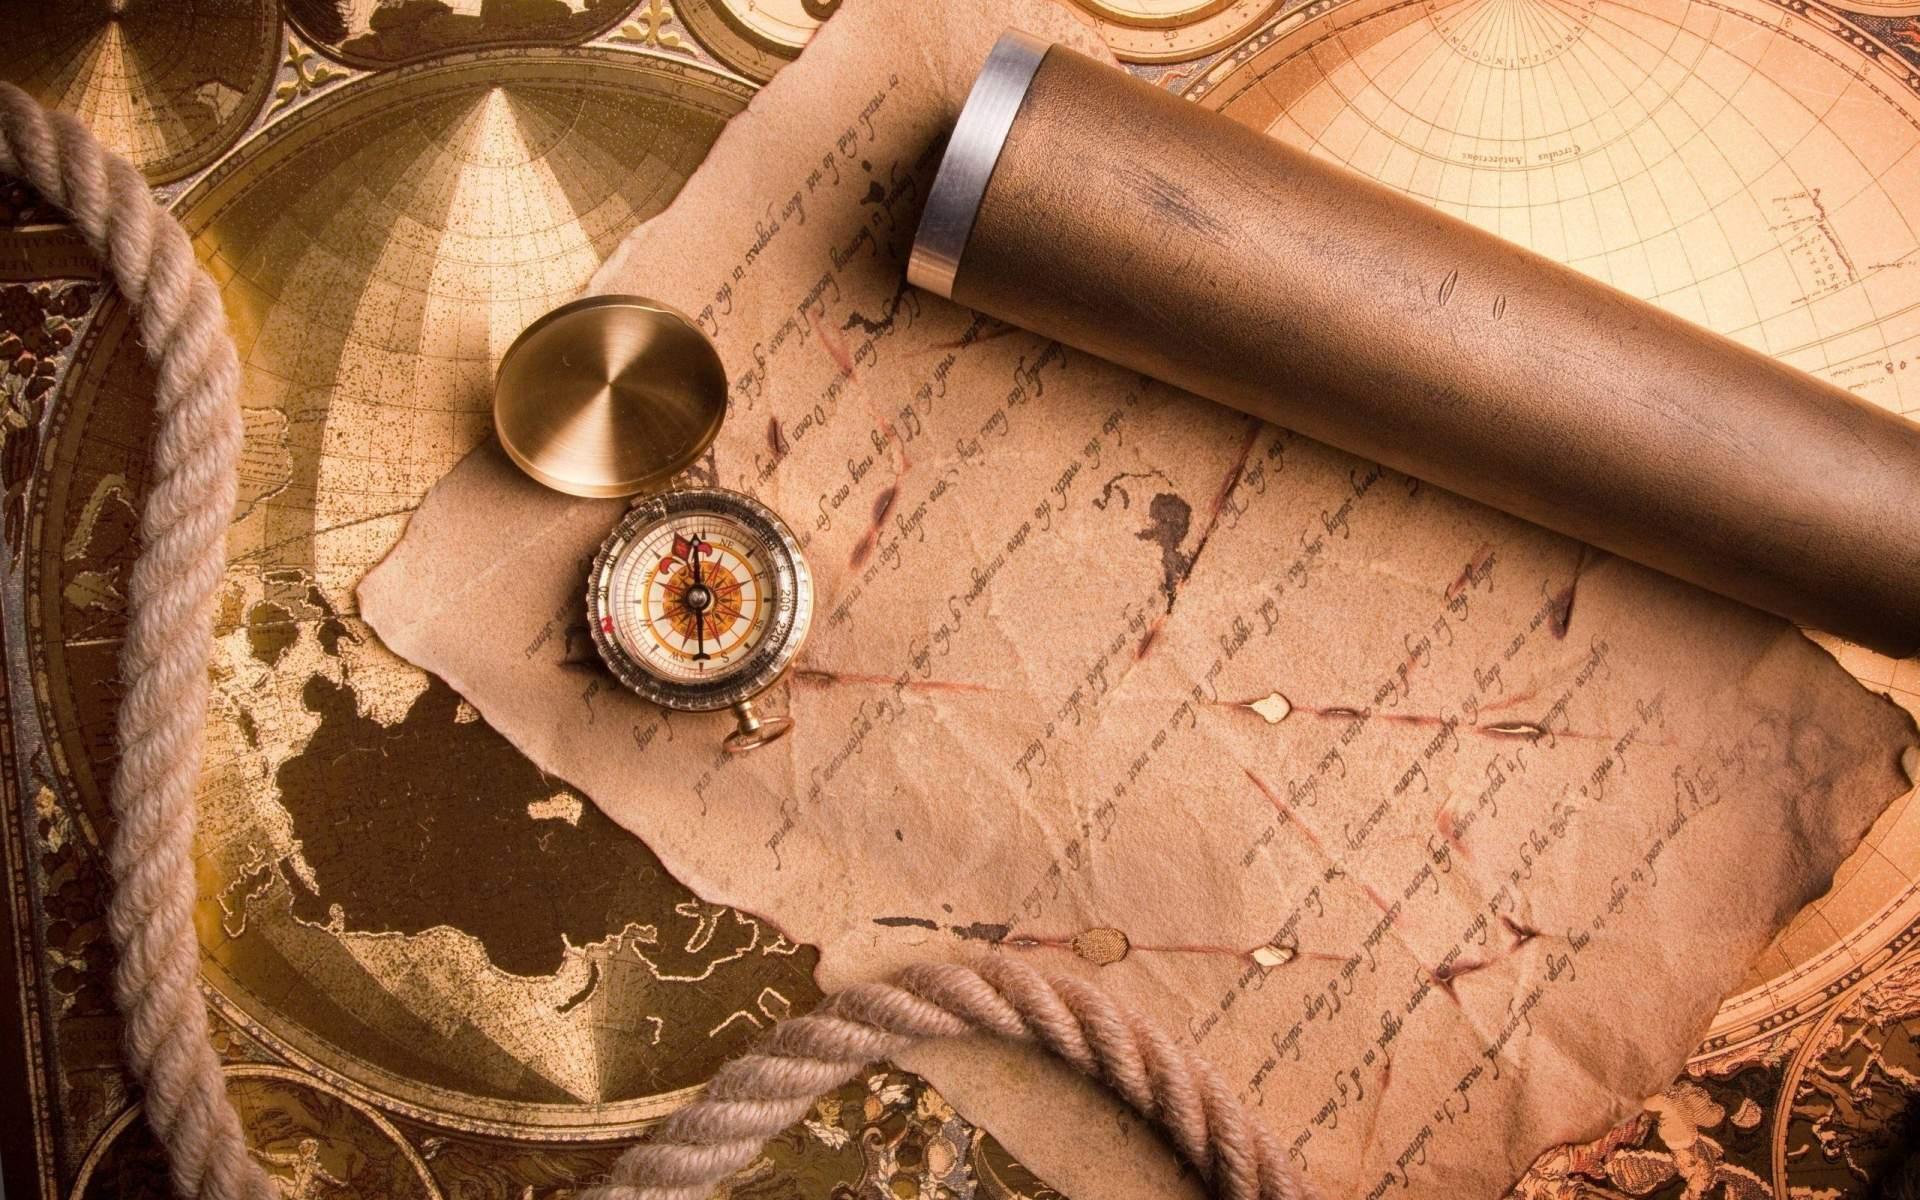 compass_telescope_old_treasure_map-1920x1200